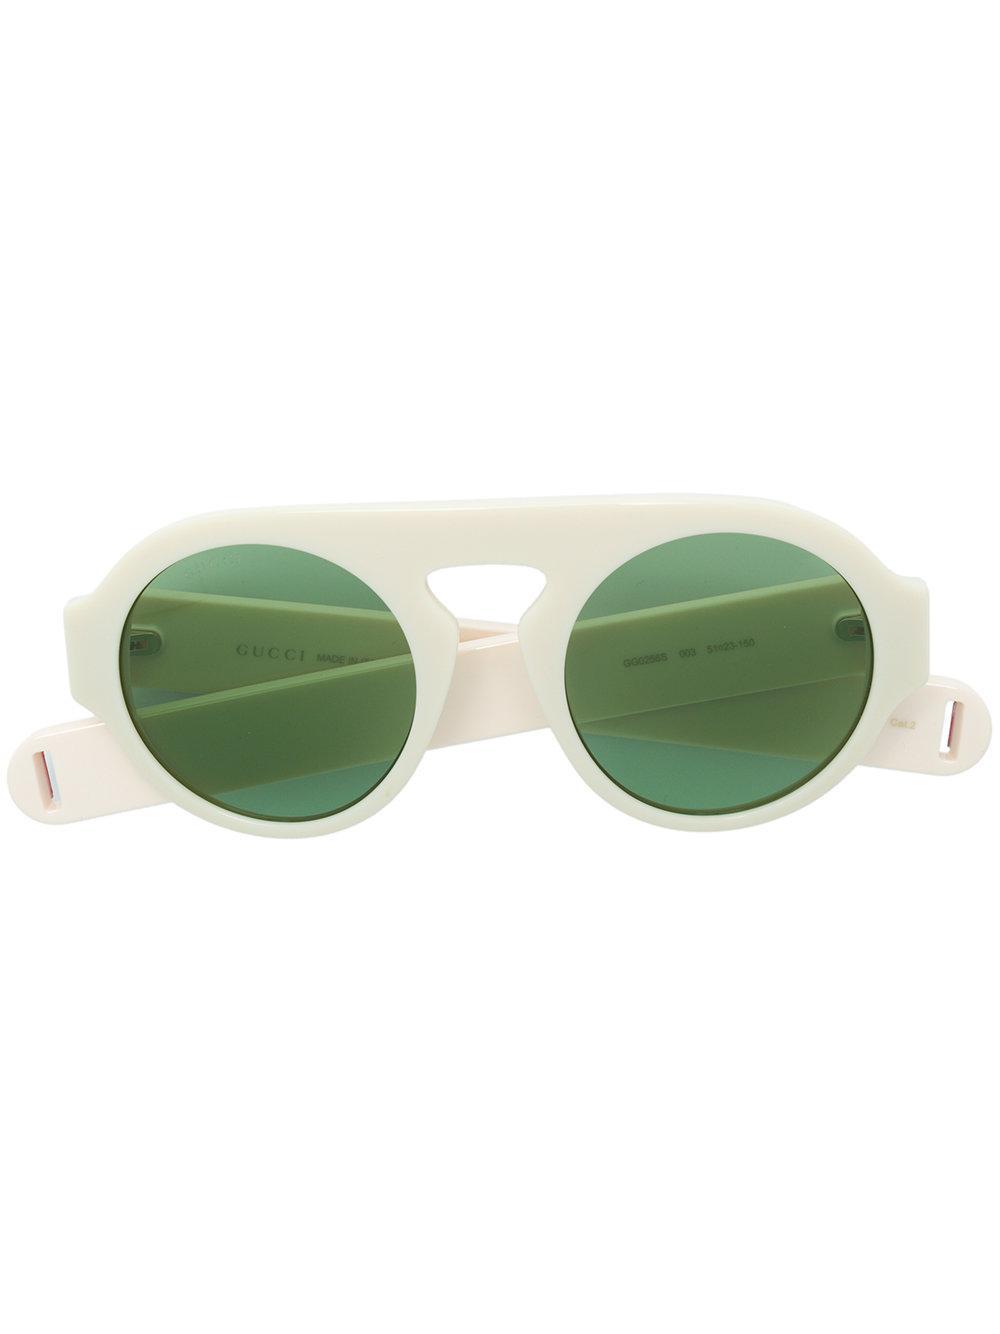 2b095a43963 Gucci Eyewear Aviator-Style Sunglasses - Neutrals